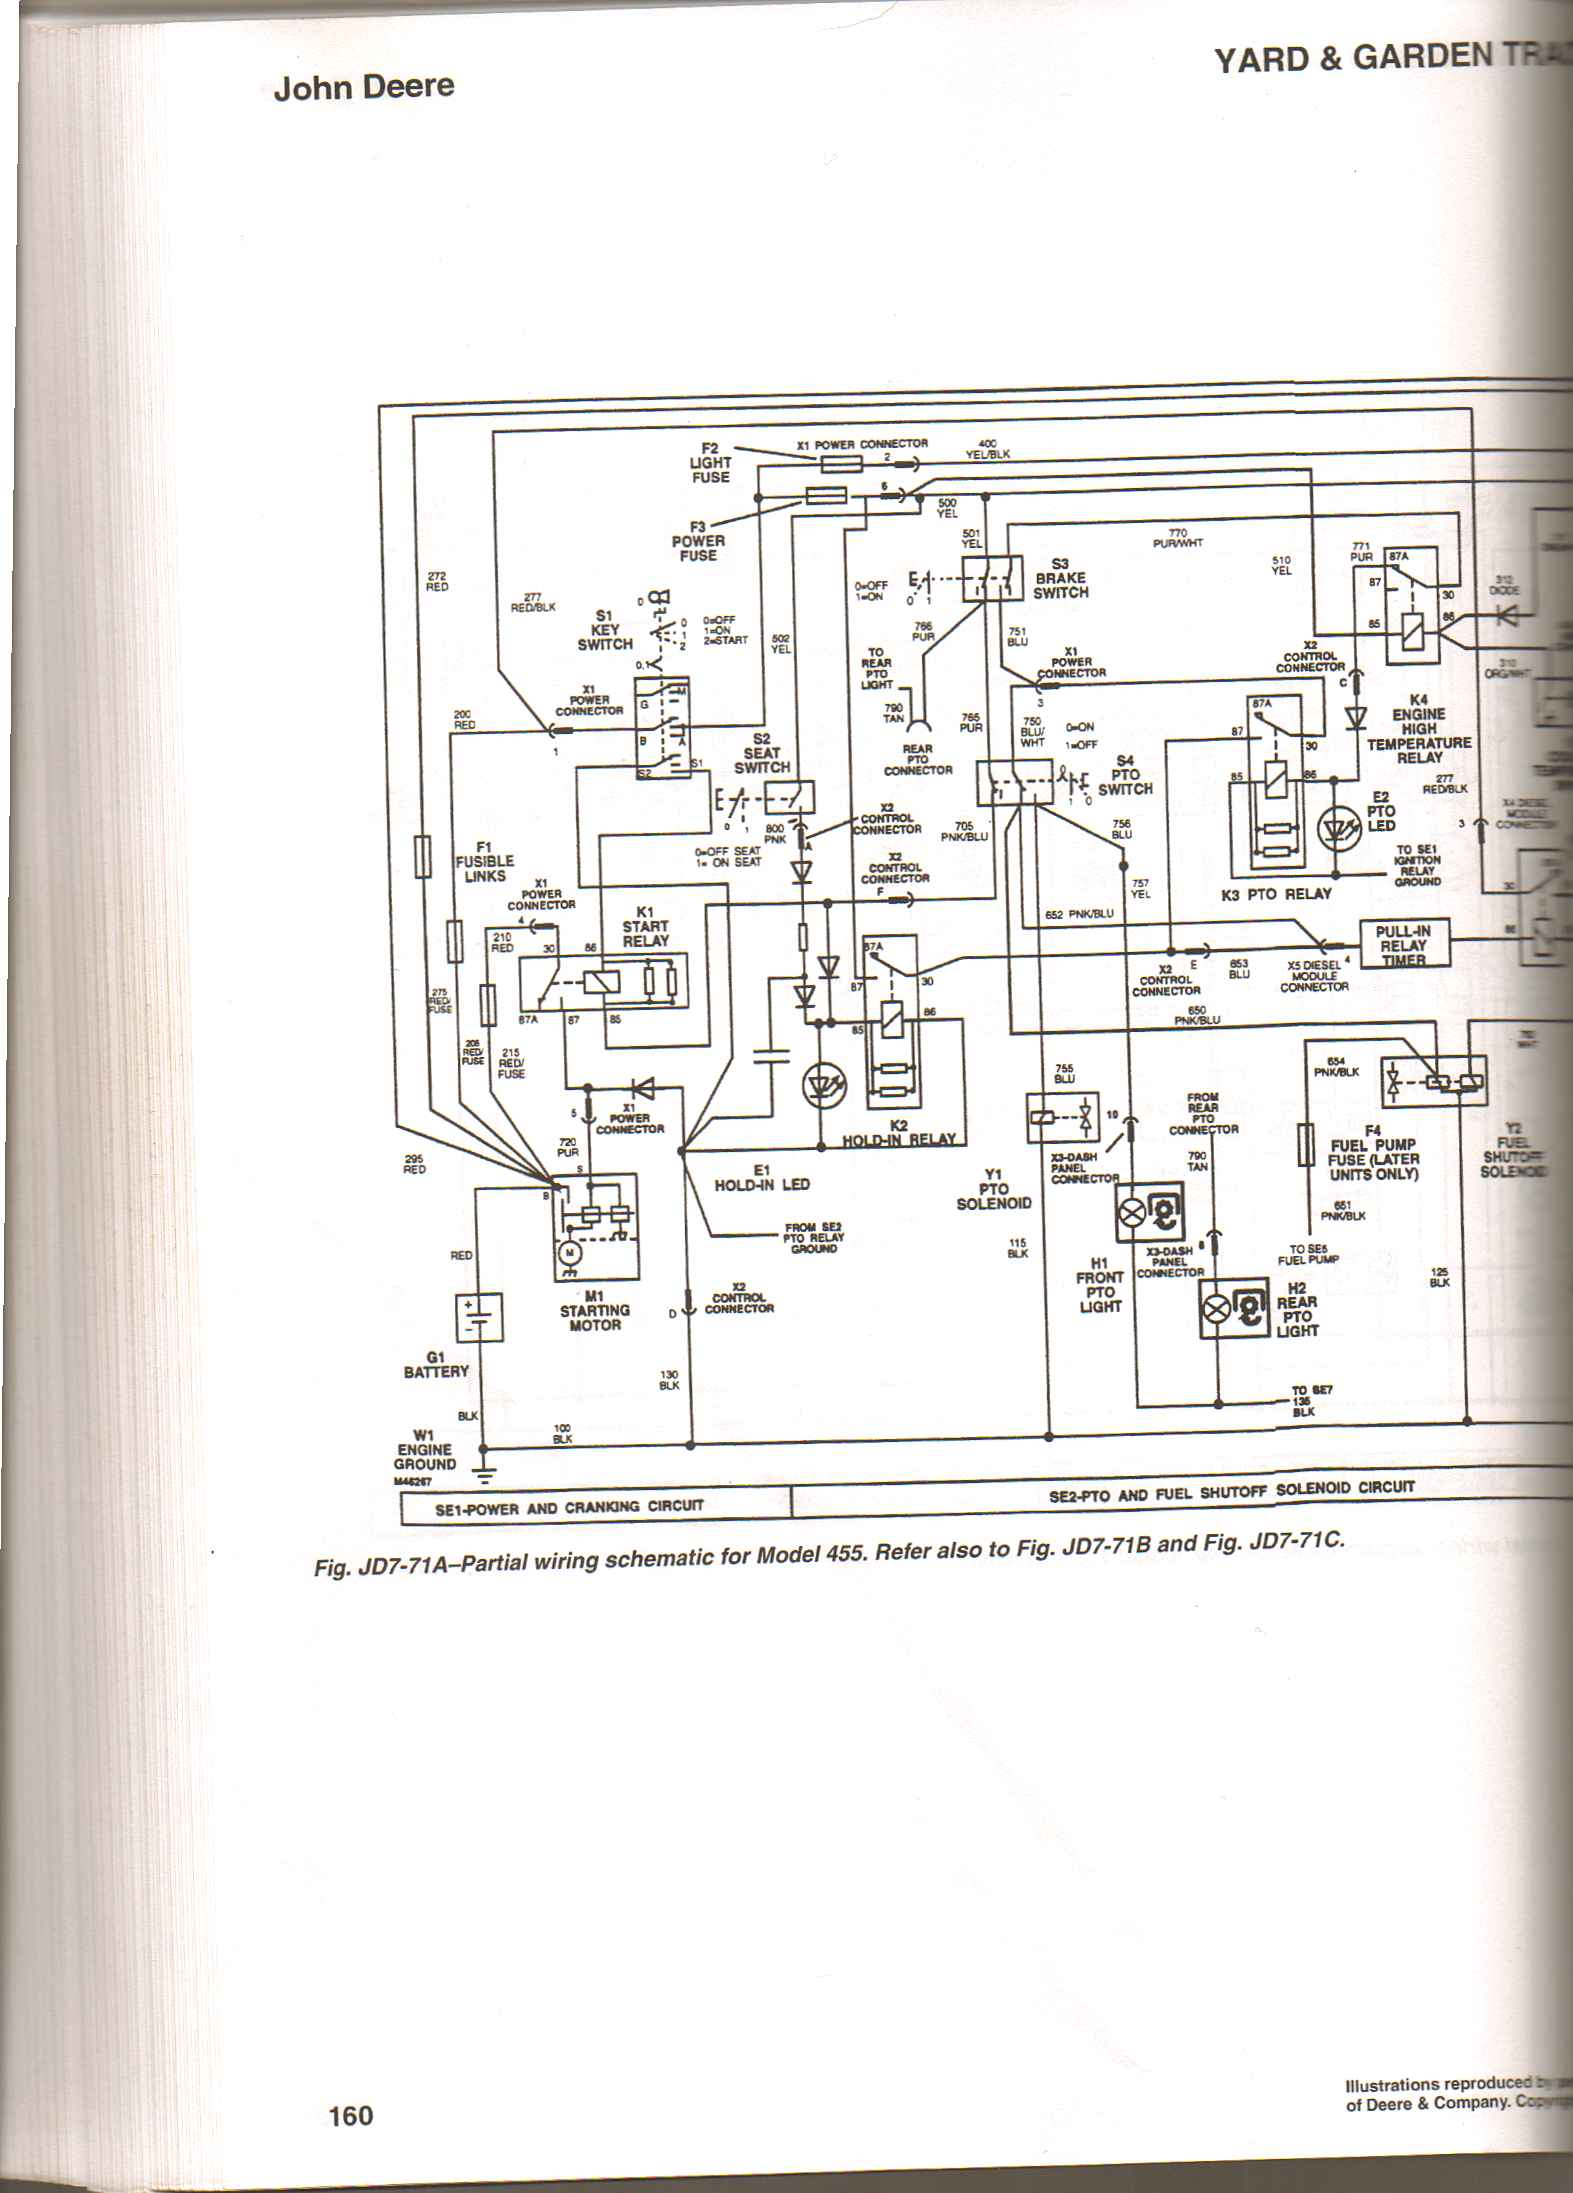 hight resolution of wiring diagram john deere lt155 15 amp john deere lt155 wiring harness